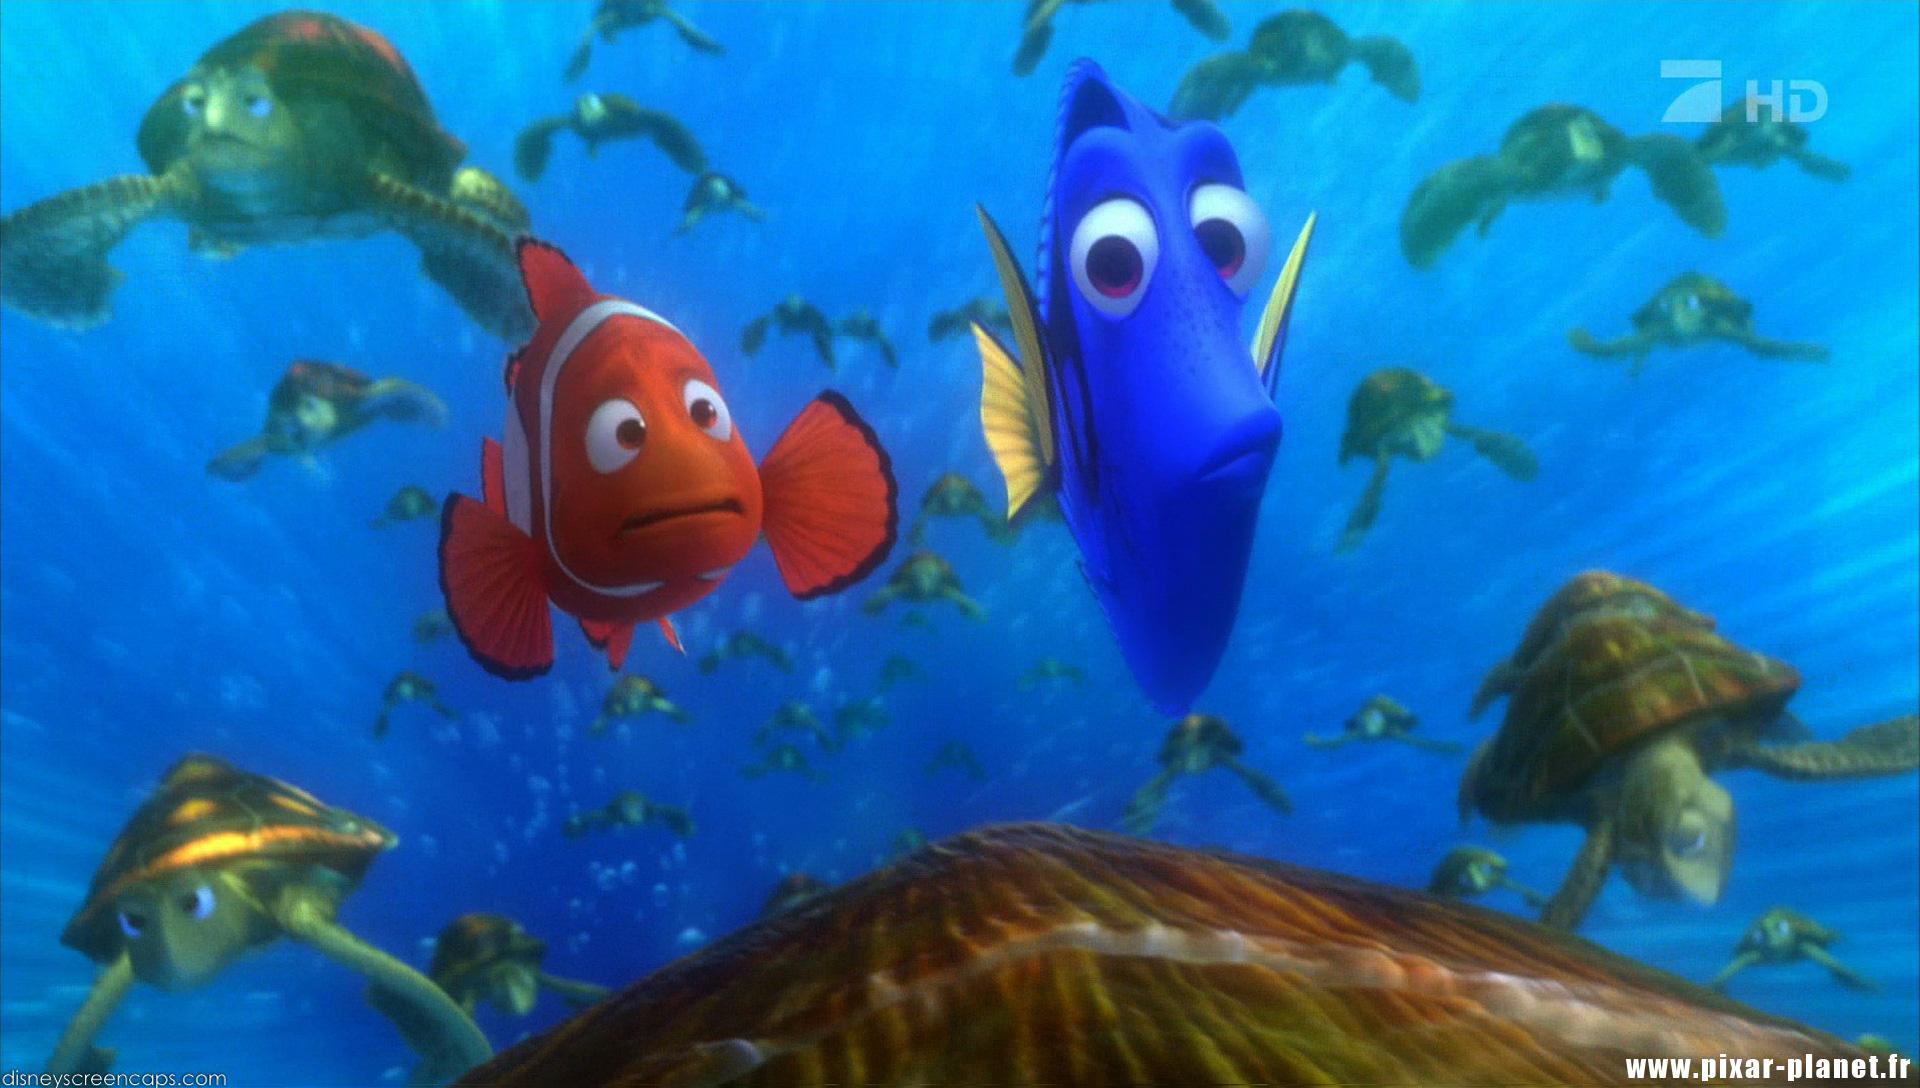 Pixar Planet Disney le monde de nemo finding